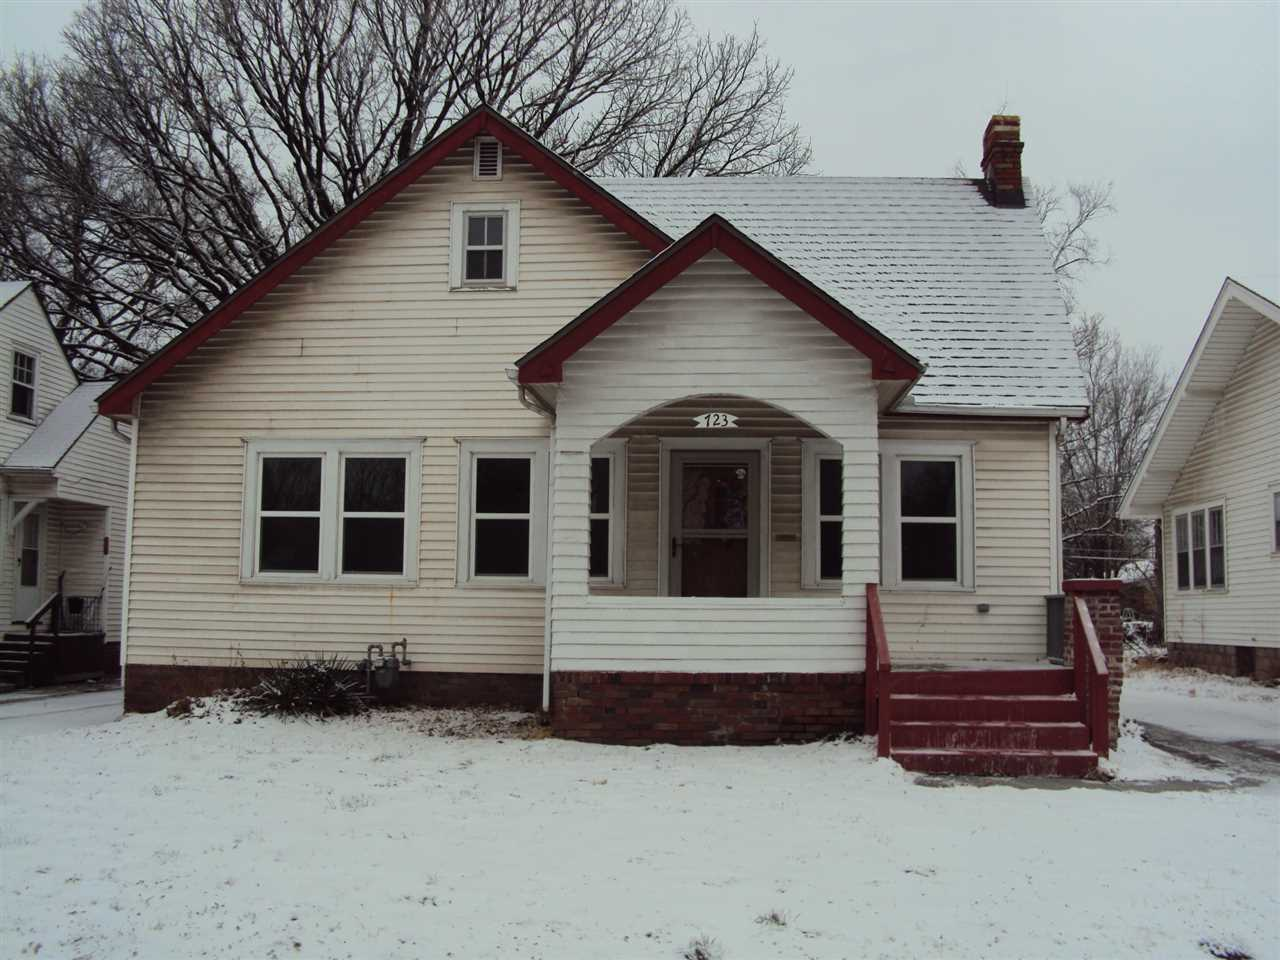 Fantastic starter home or rental property. Original hardwood floors in living room and bedrooms. Lot